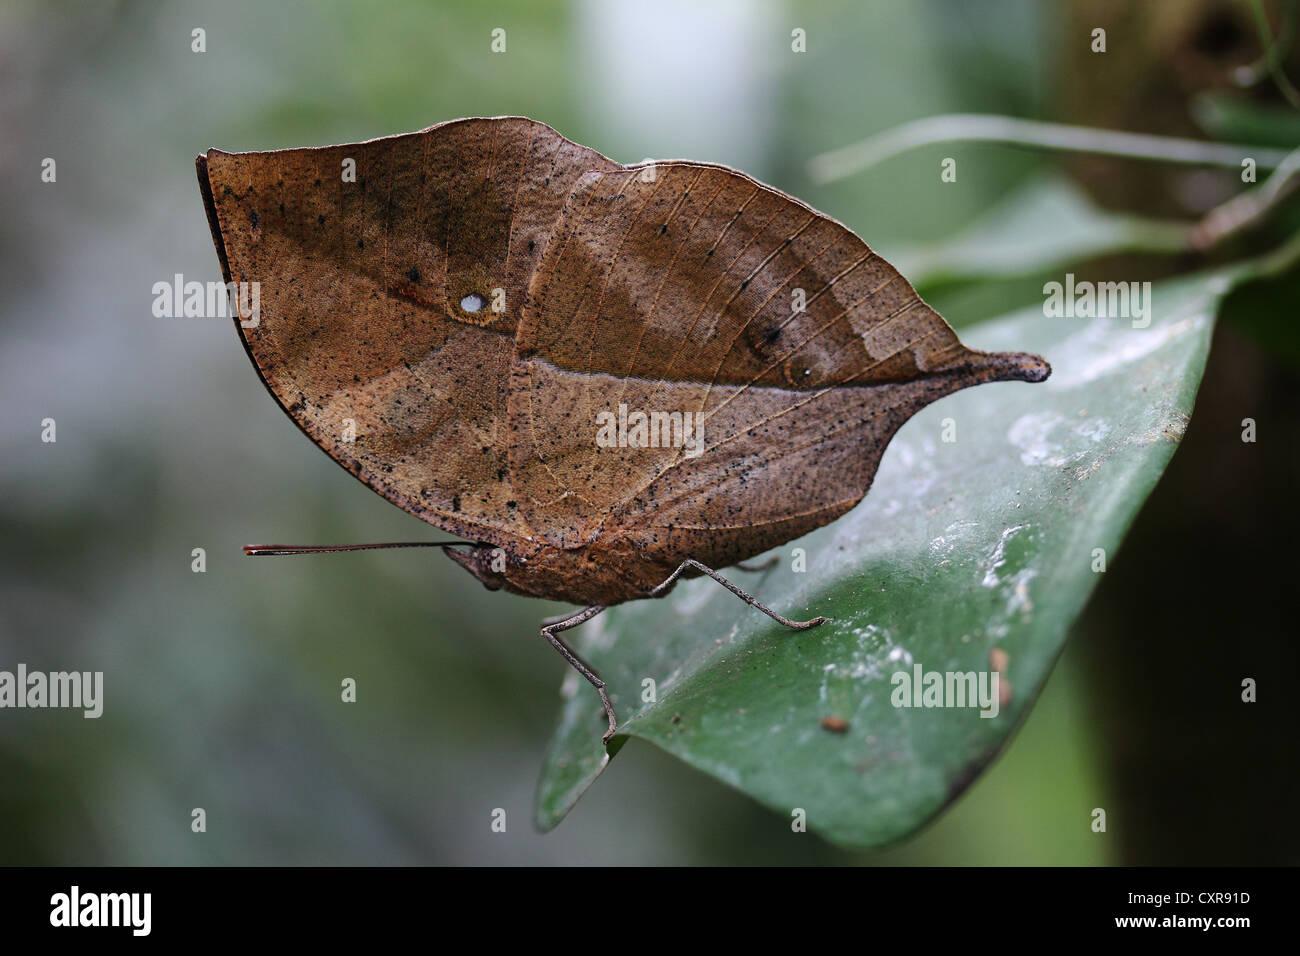 Foglia indiano butterfly (Kallima paralekta), Isola di Mainau, Baden-Wuerttemberg, Germania, Europa Immagini Stock